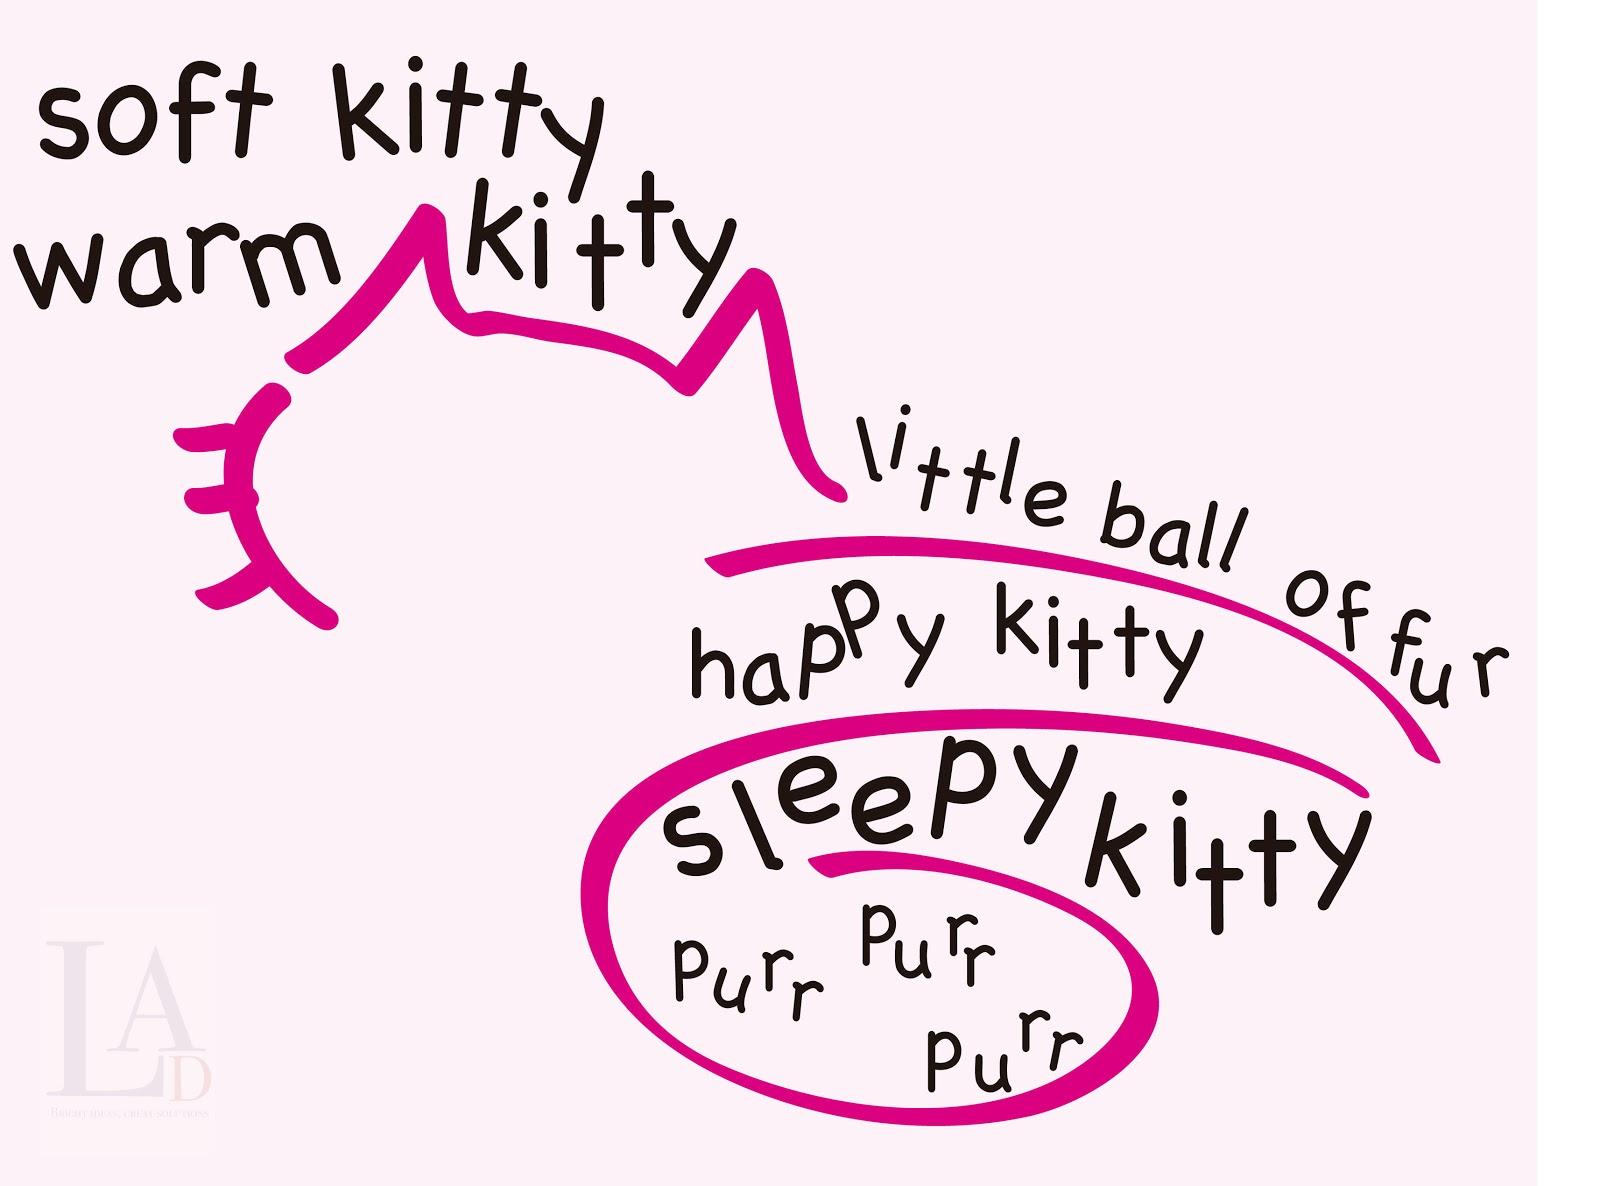 Soft Kitty ringtone free download